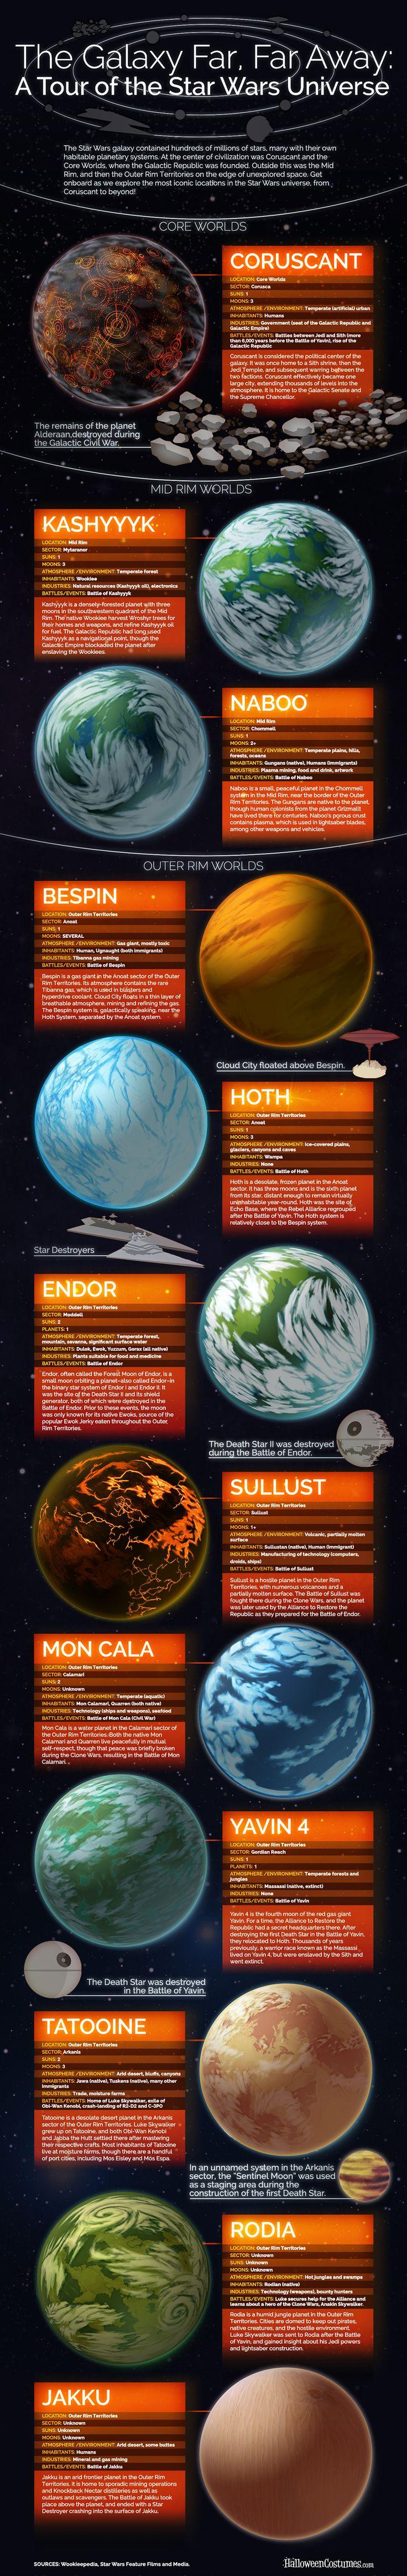 The Galaxy Far, Far Away: A Tour of the Star Wars Universe: